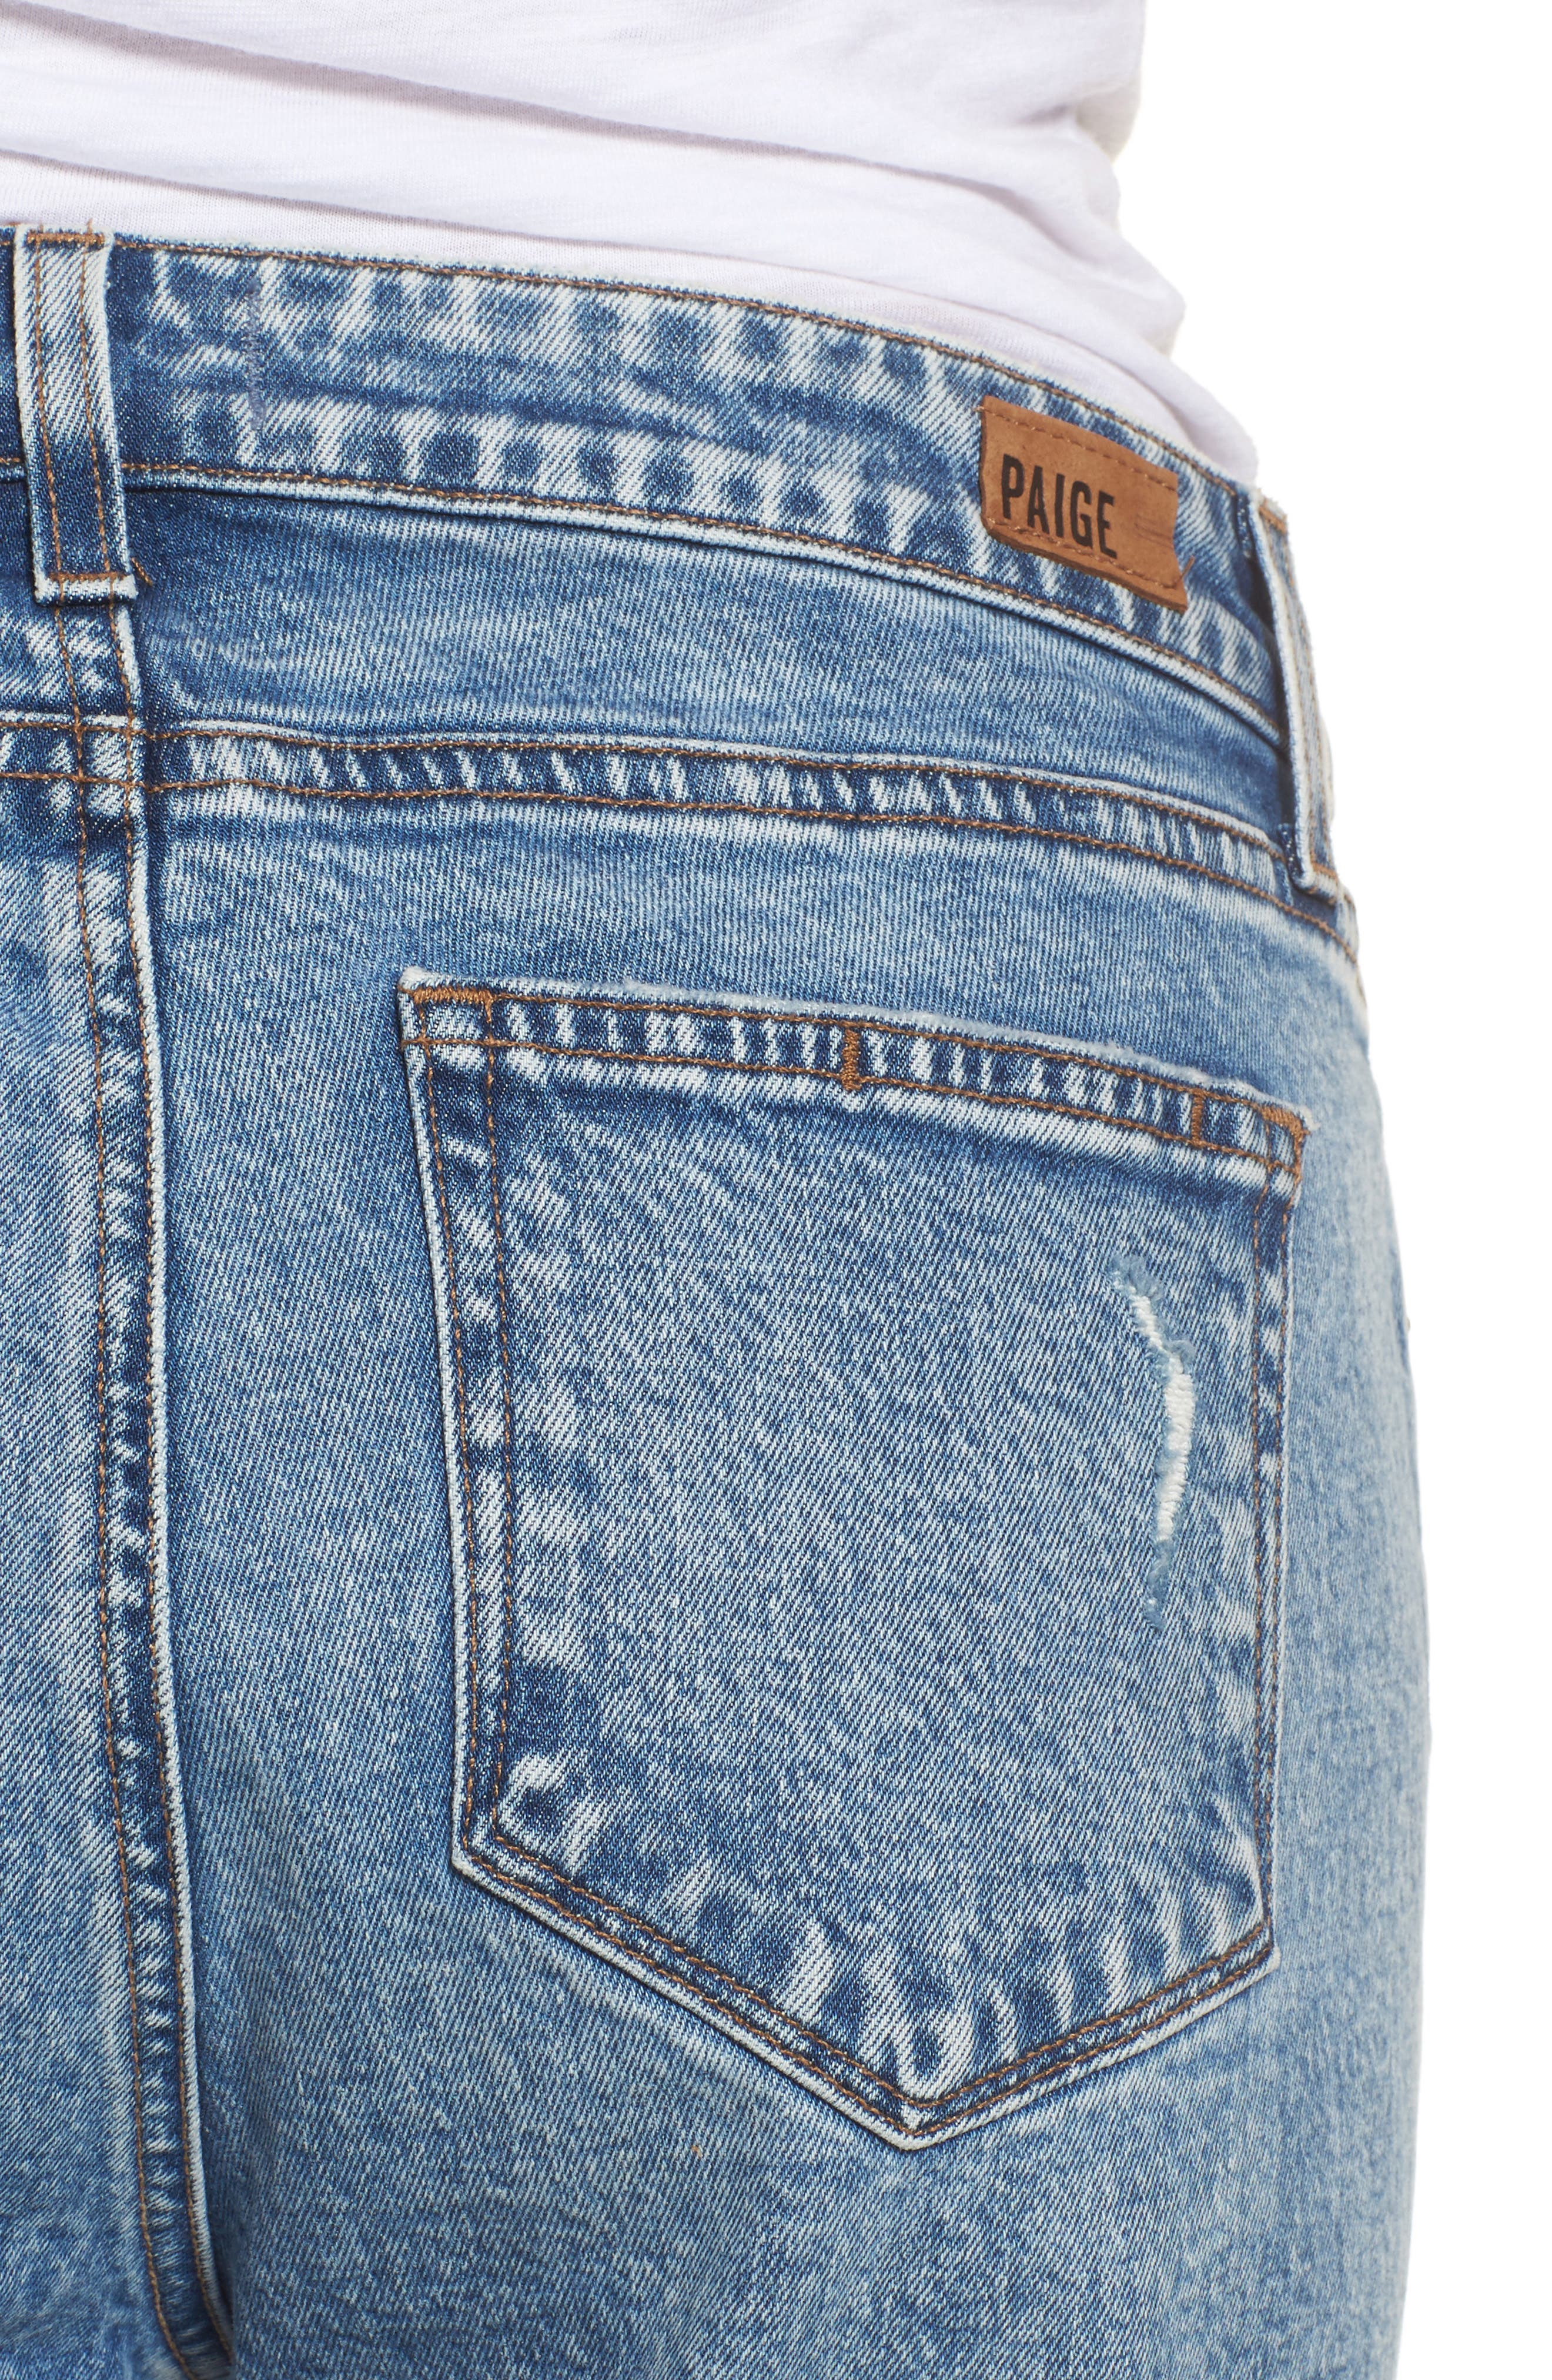 Noella Straight Leg Crop Jeans,                             Alternate thumbnail 5, color,                             Westlyn Destructed